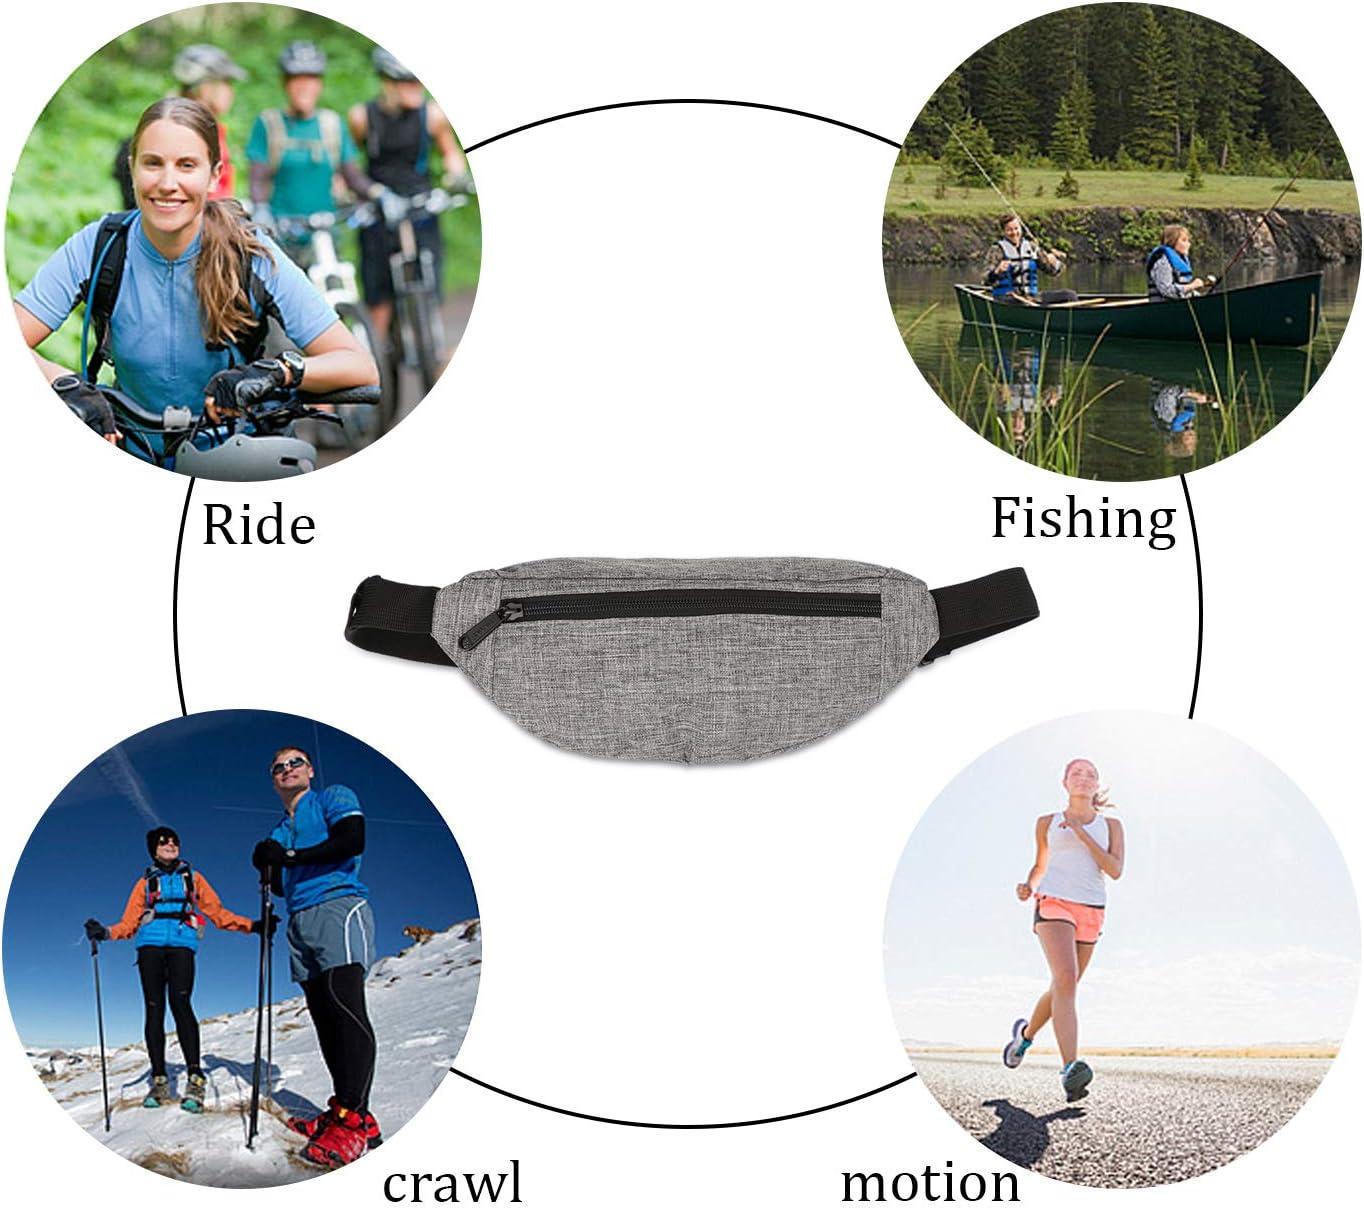 Aderenti Ciclismo Cintura Fitness Cintura da Corsa Impermeabile Tasche da Corsa Regolabili di Grande capacit/à Leggere e Impermeabili Sooair Marsupio Sportivo per allenamenti in Palestra